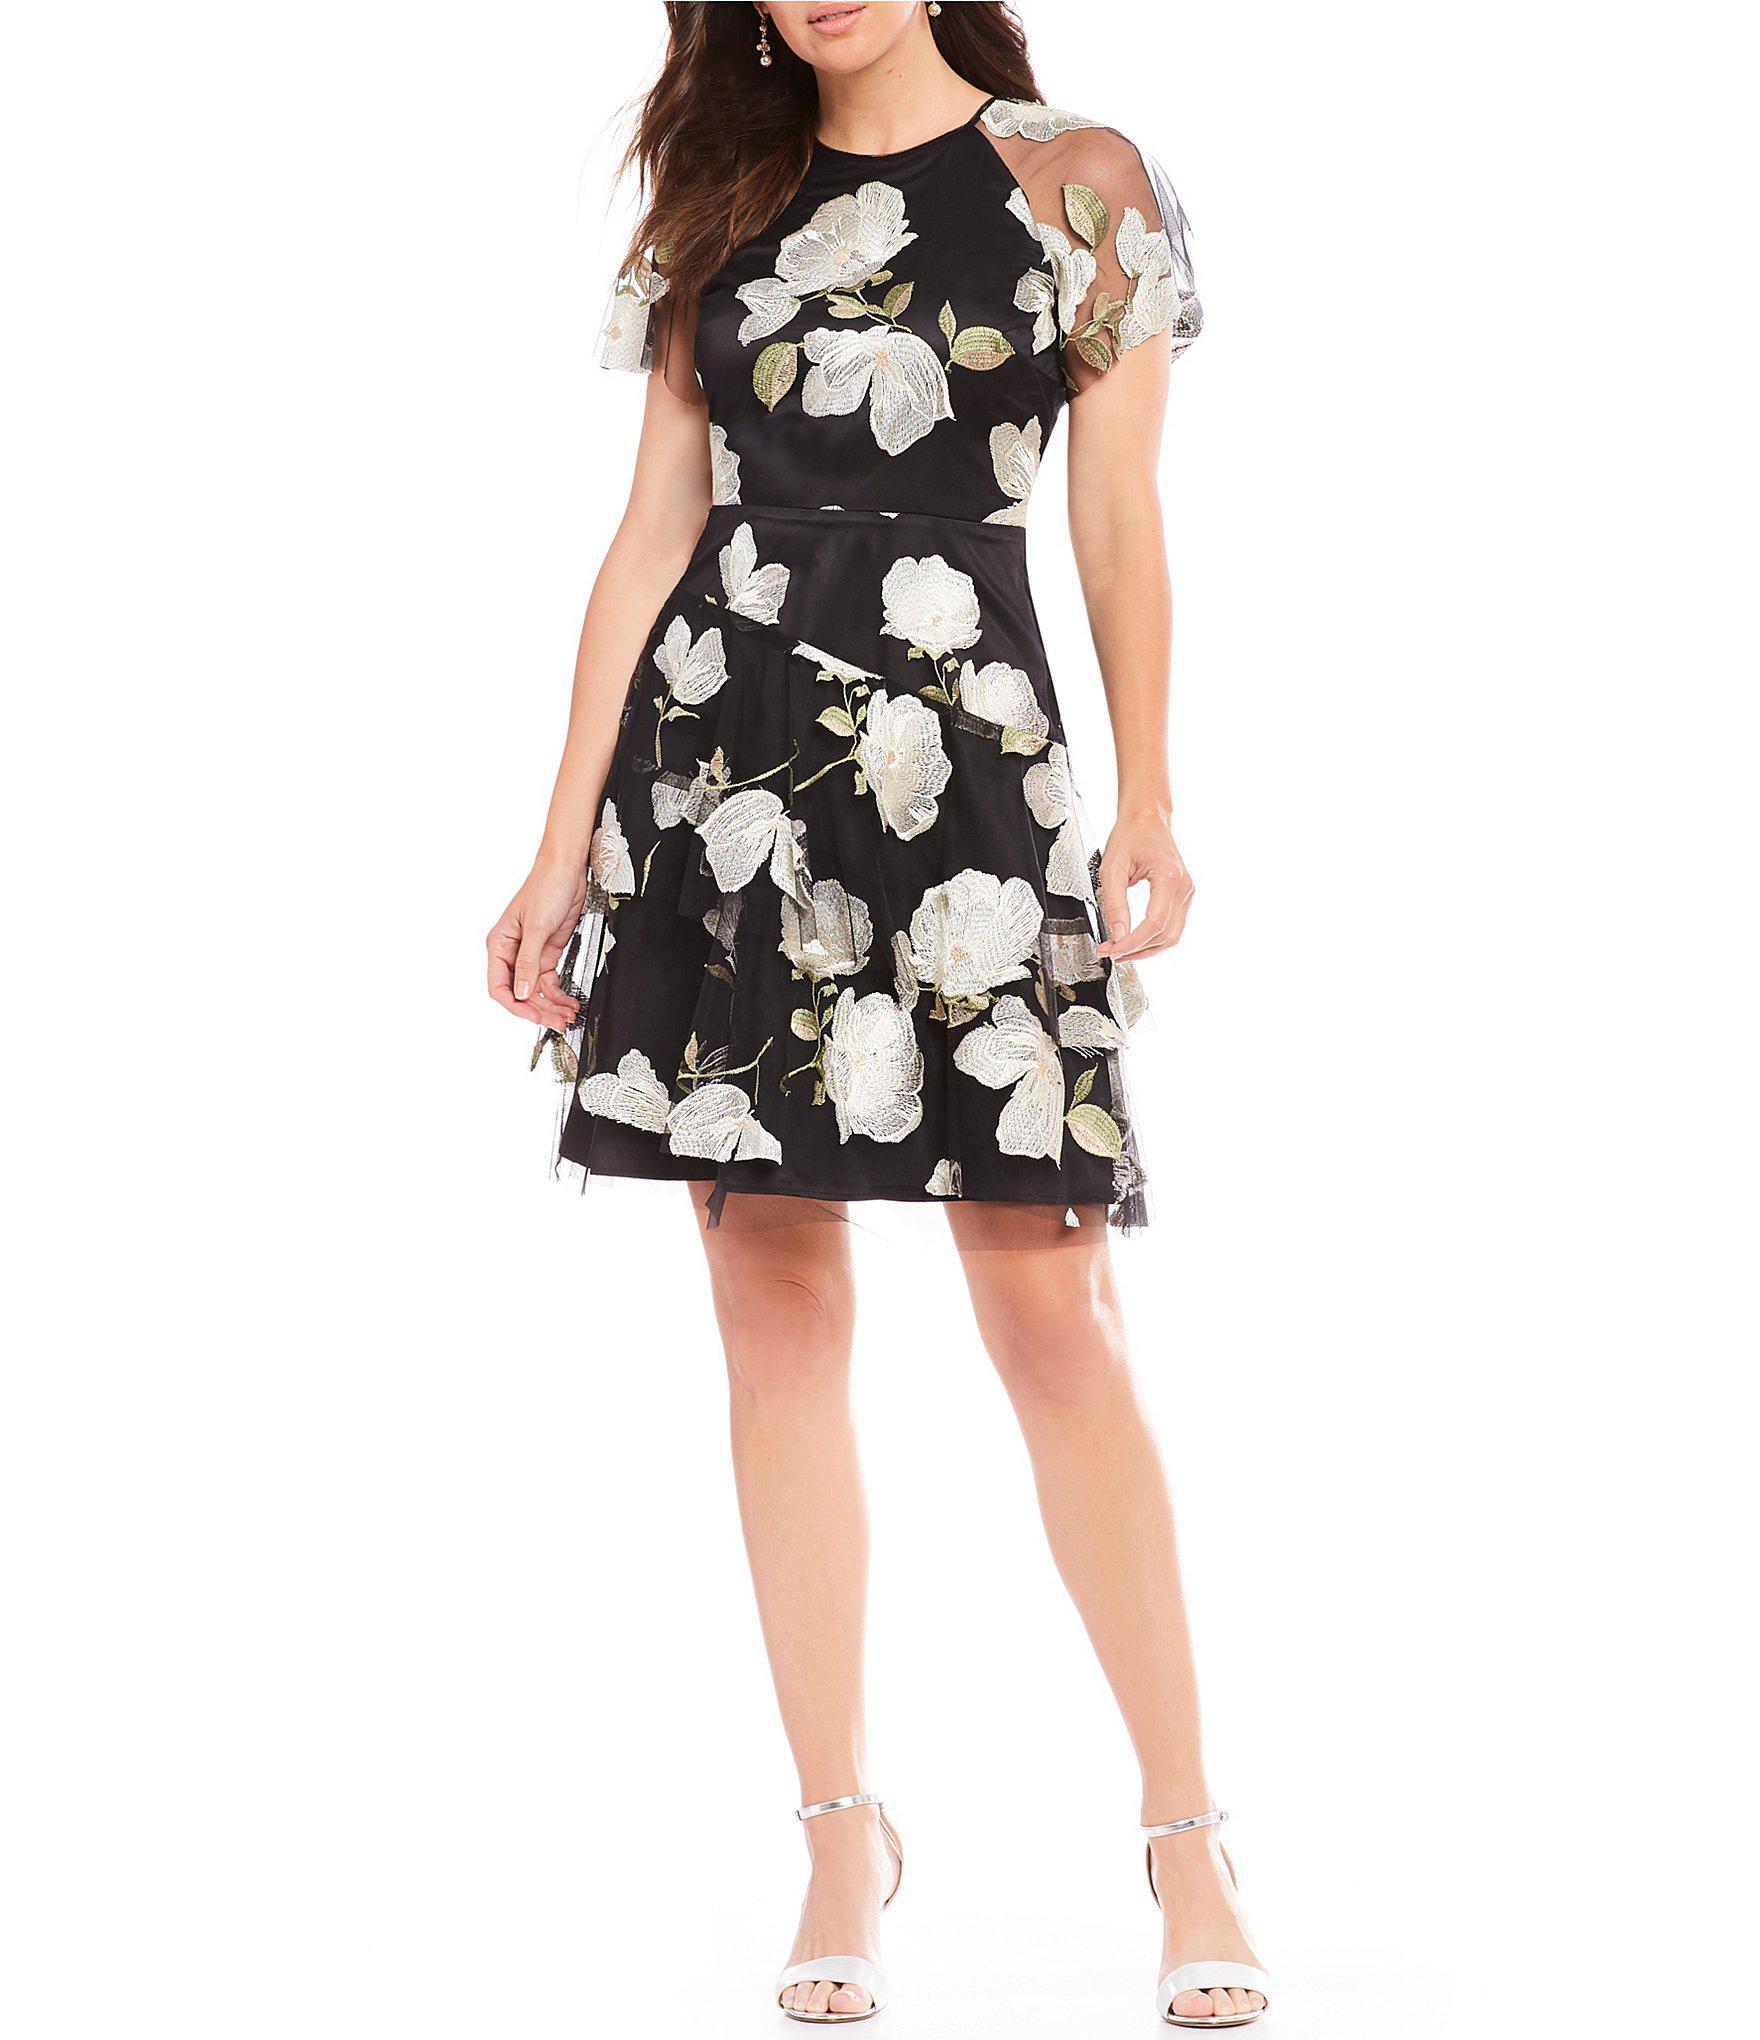 87a817cd7271 Petite Cocktail Dresses Dillards